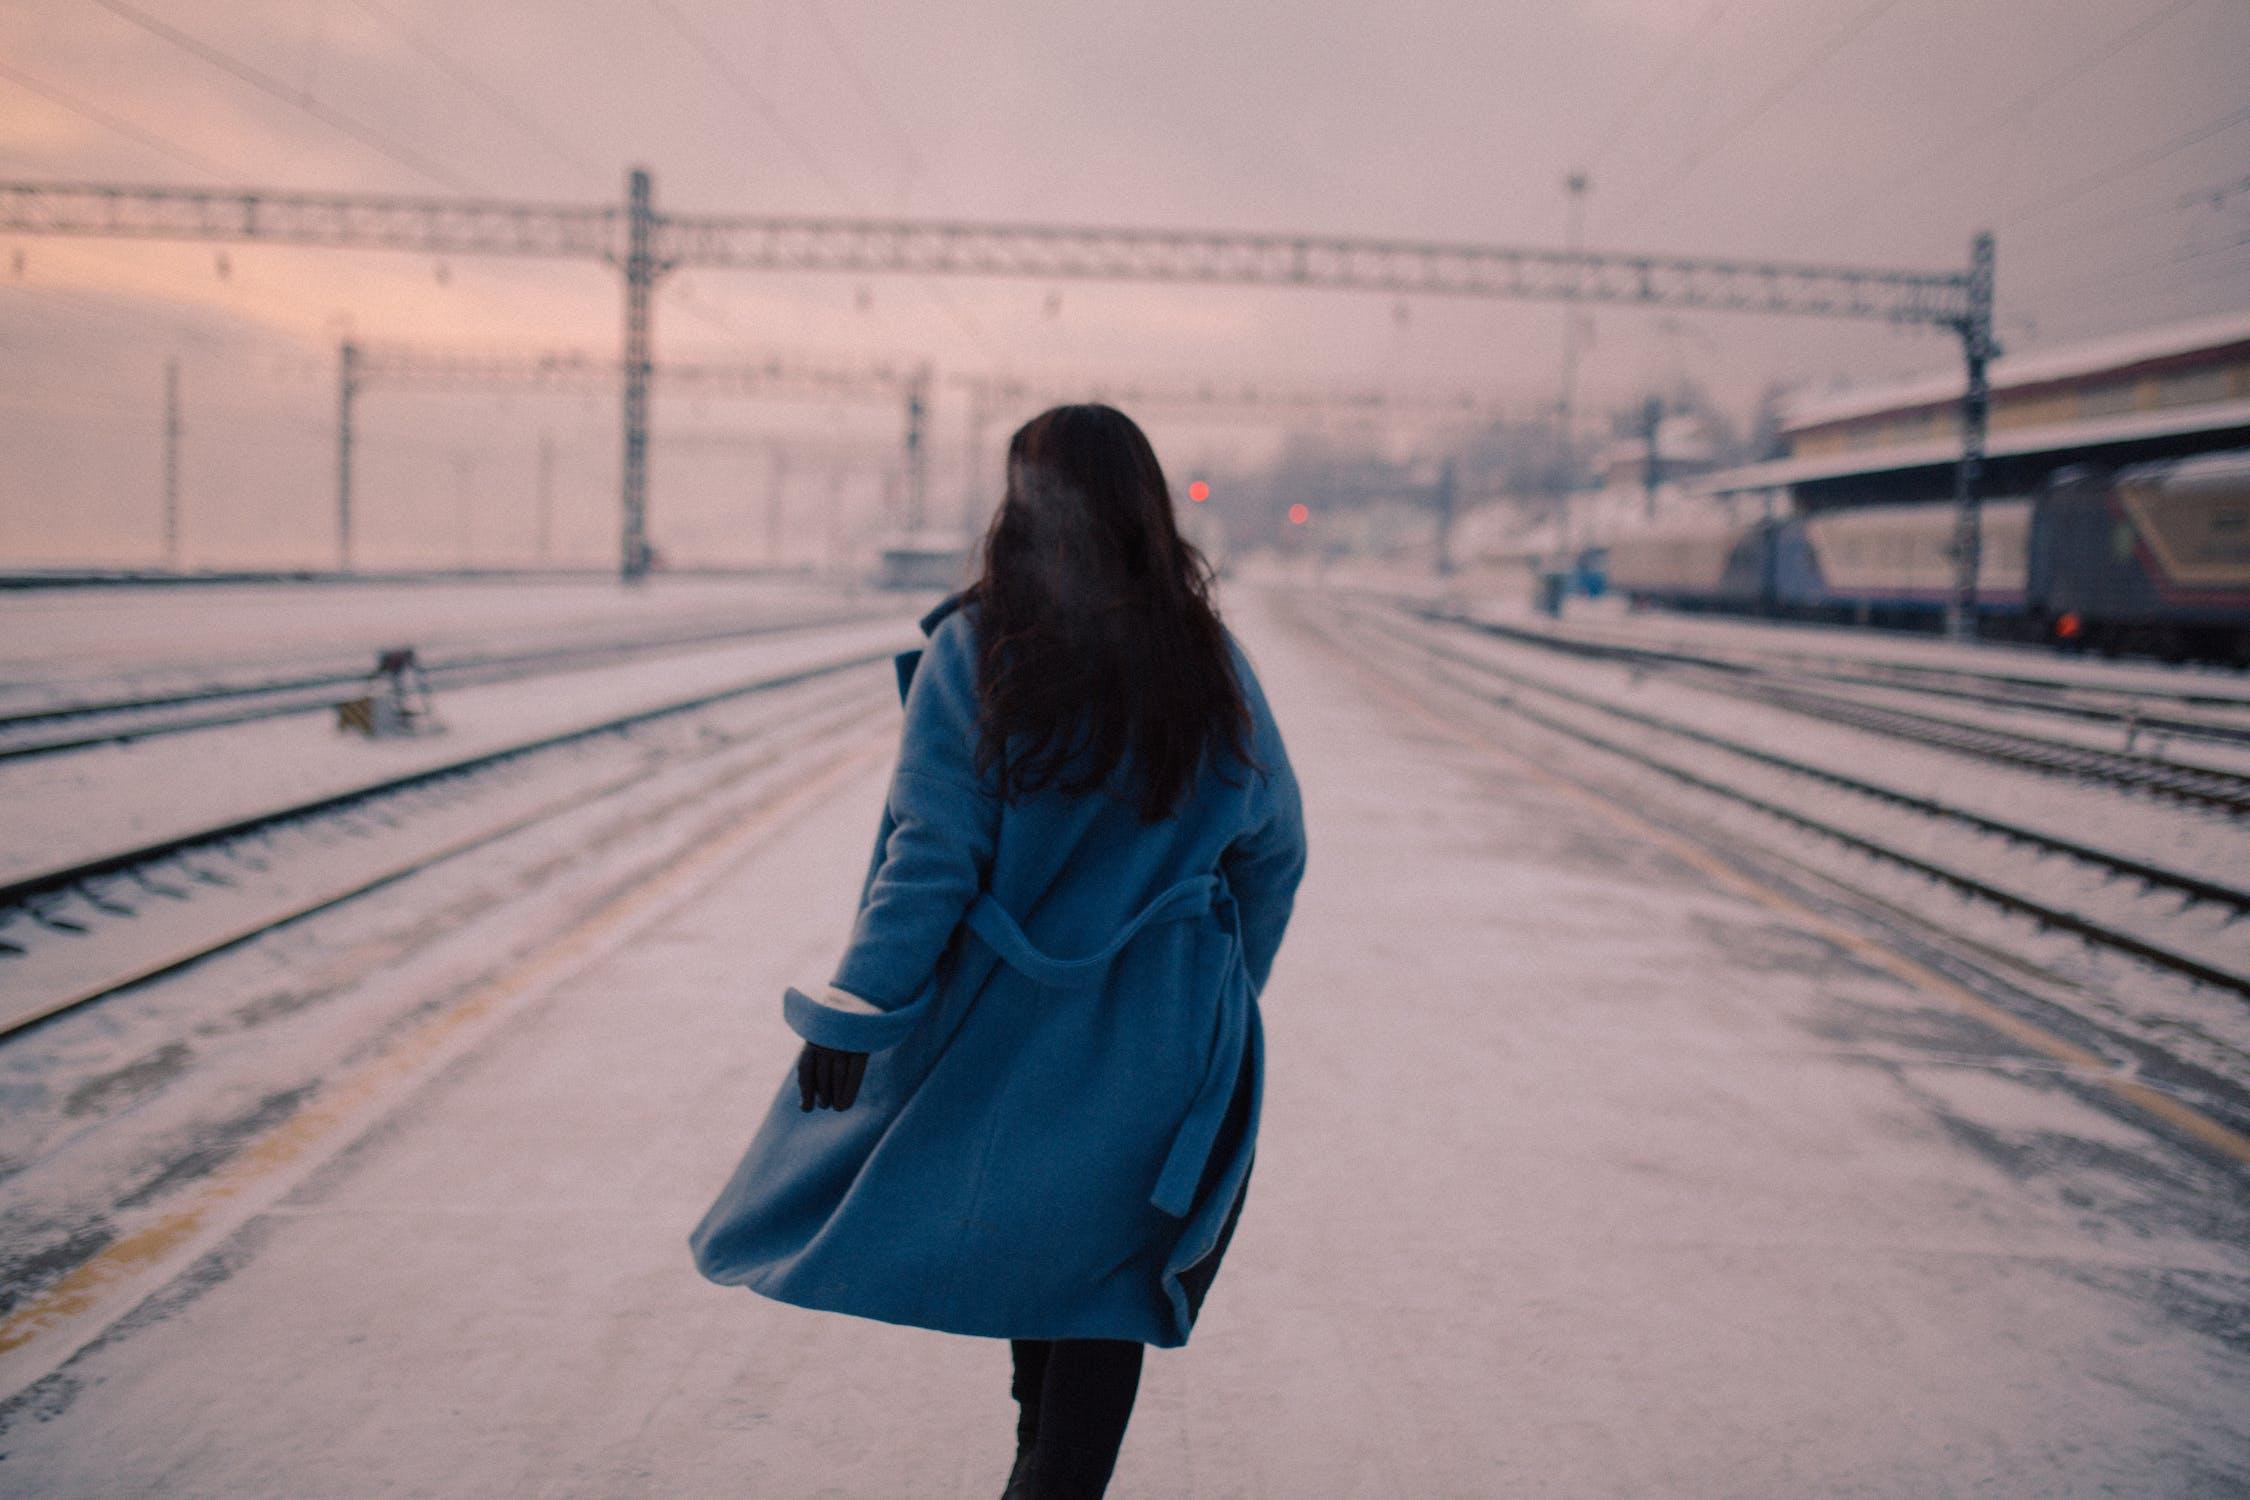 Winter @ Photo by Daria Nekipelova from Pexels